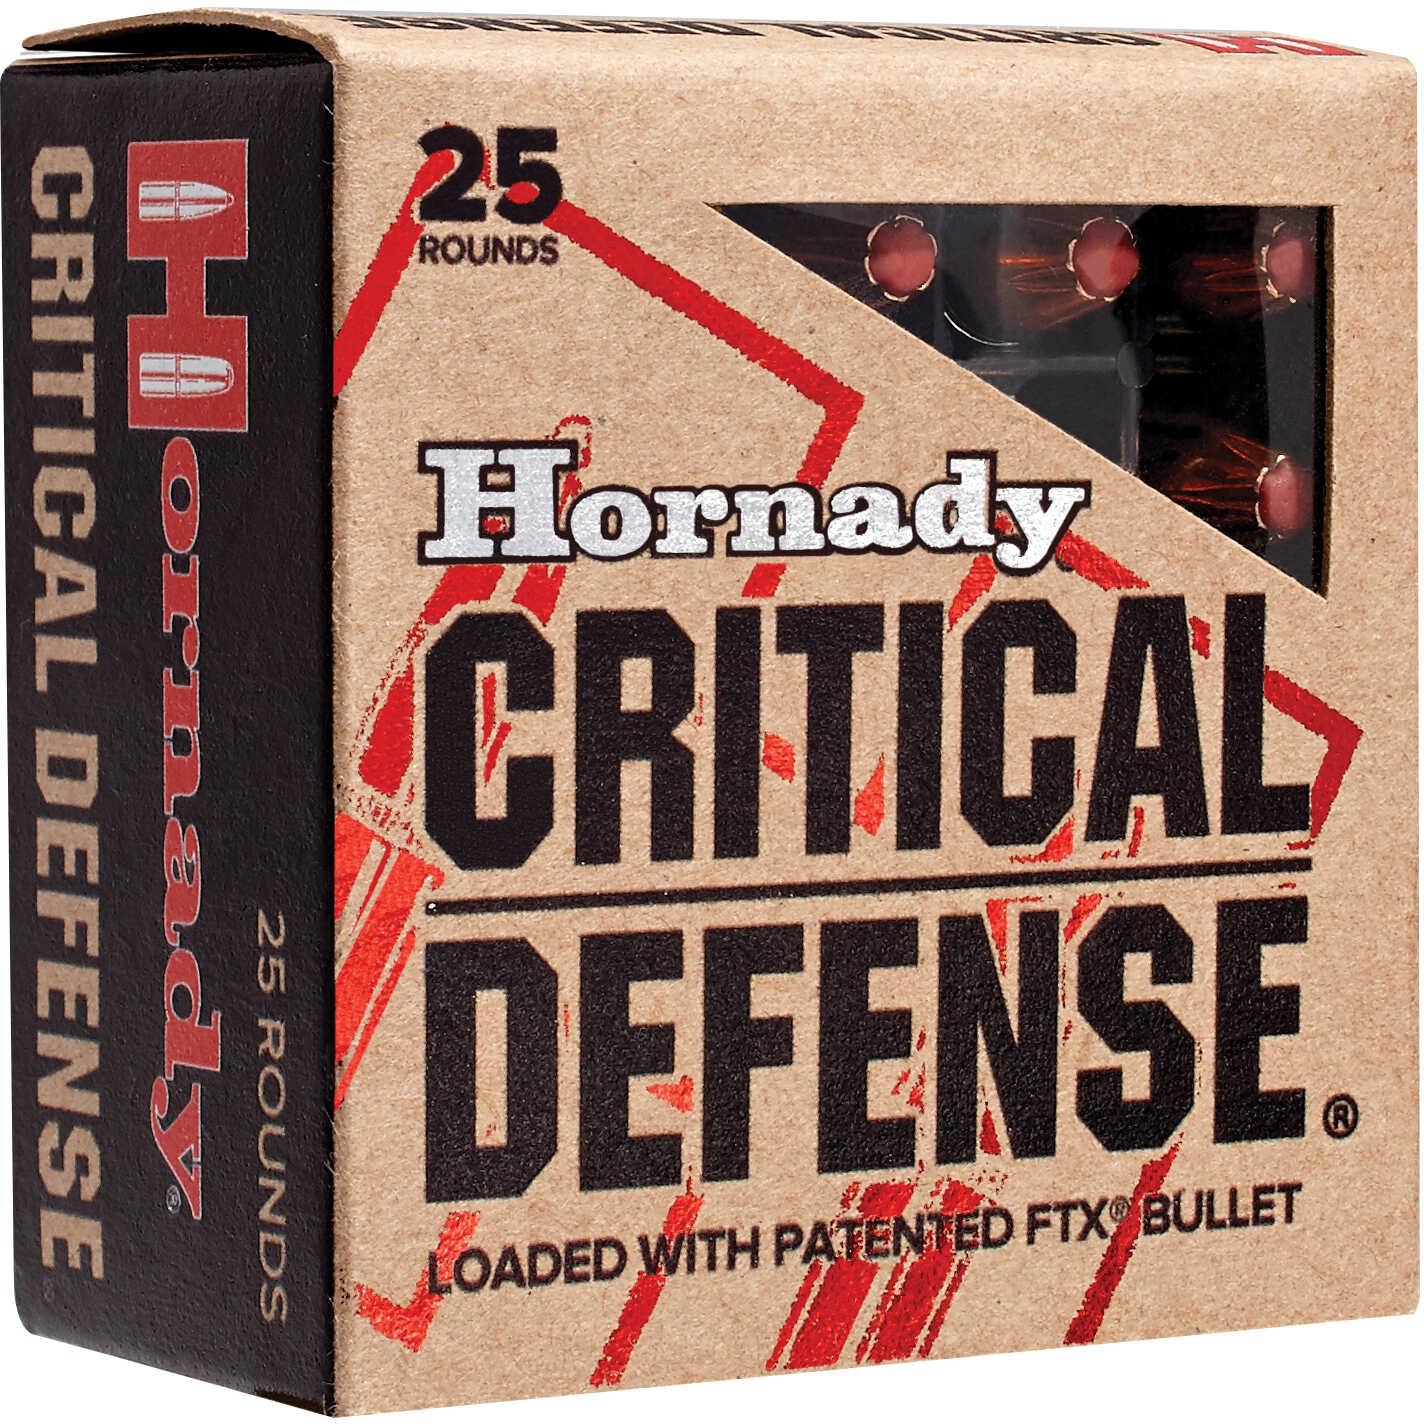 Hornady Critical Defense 38 Special+P 110Grain Per 25 Ammunition Md: 90311